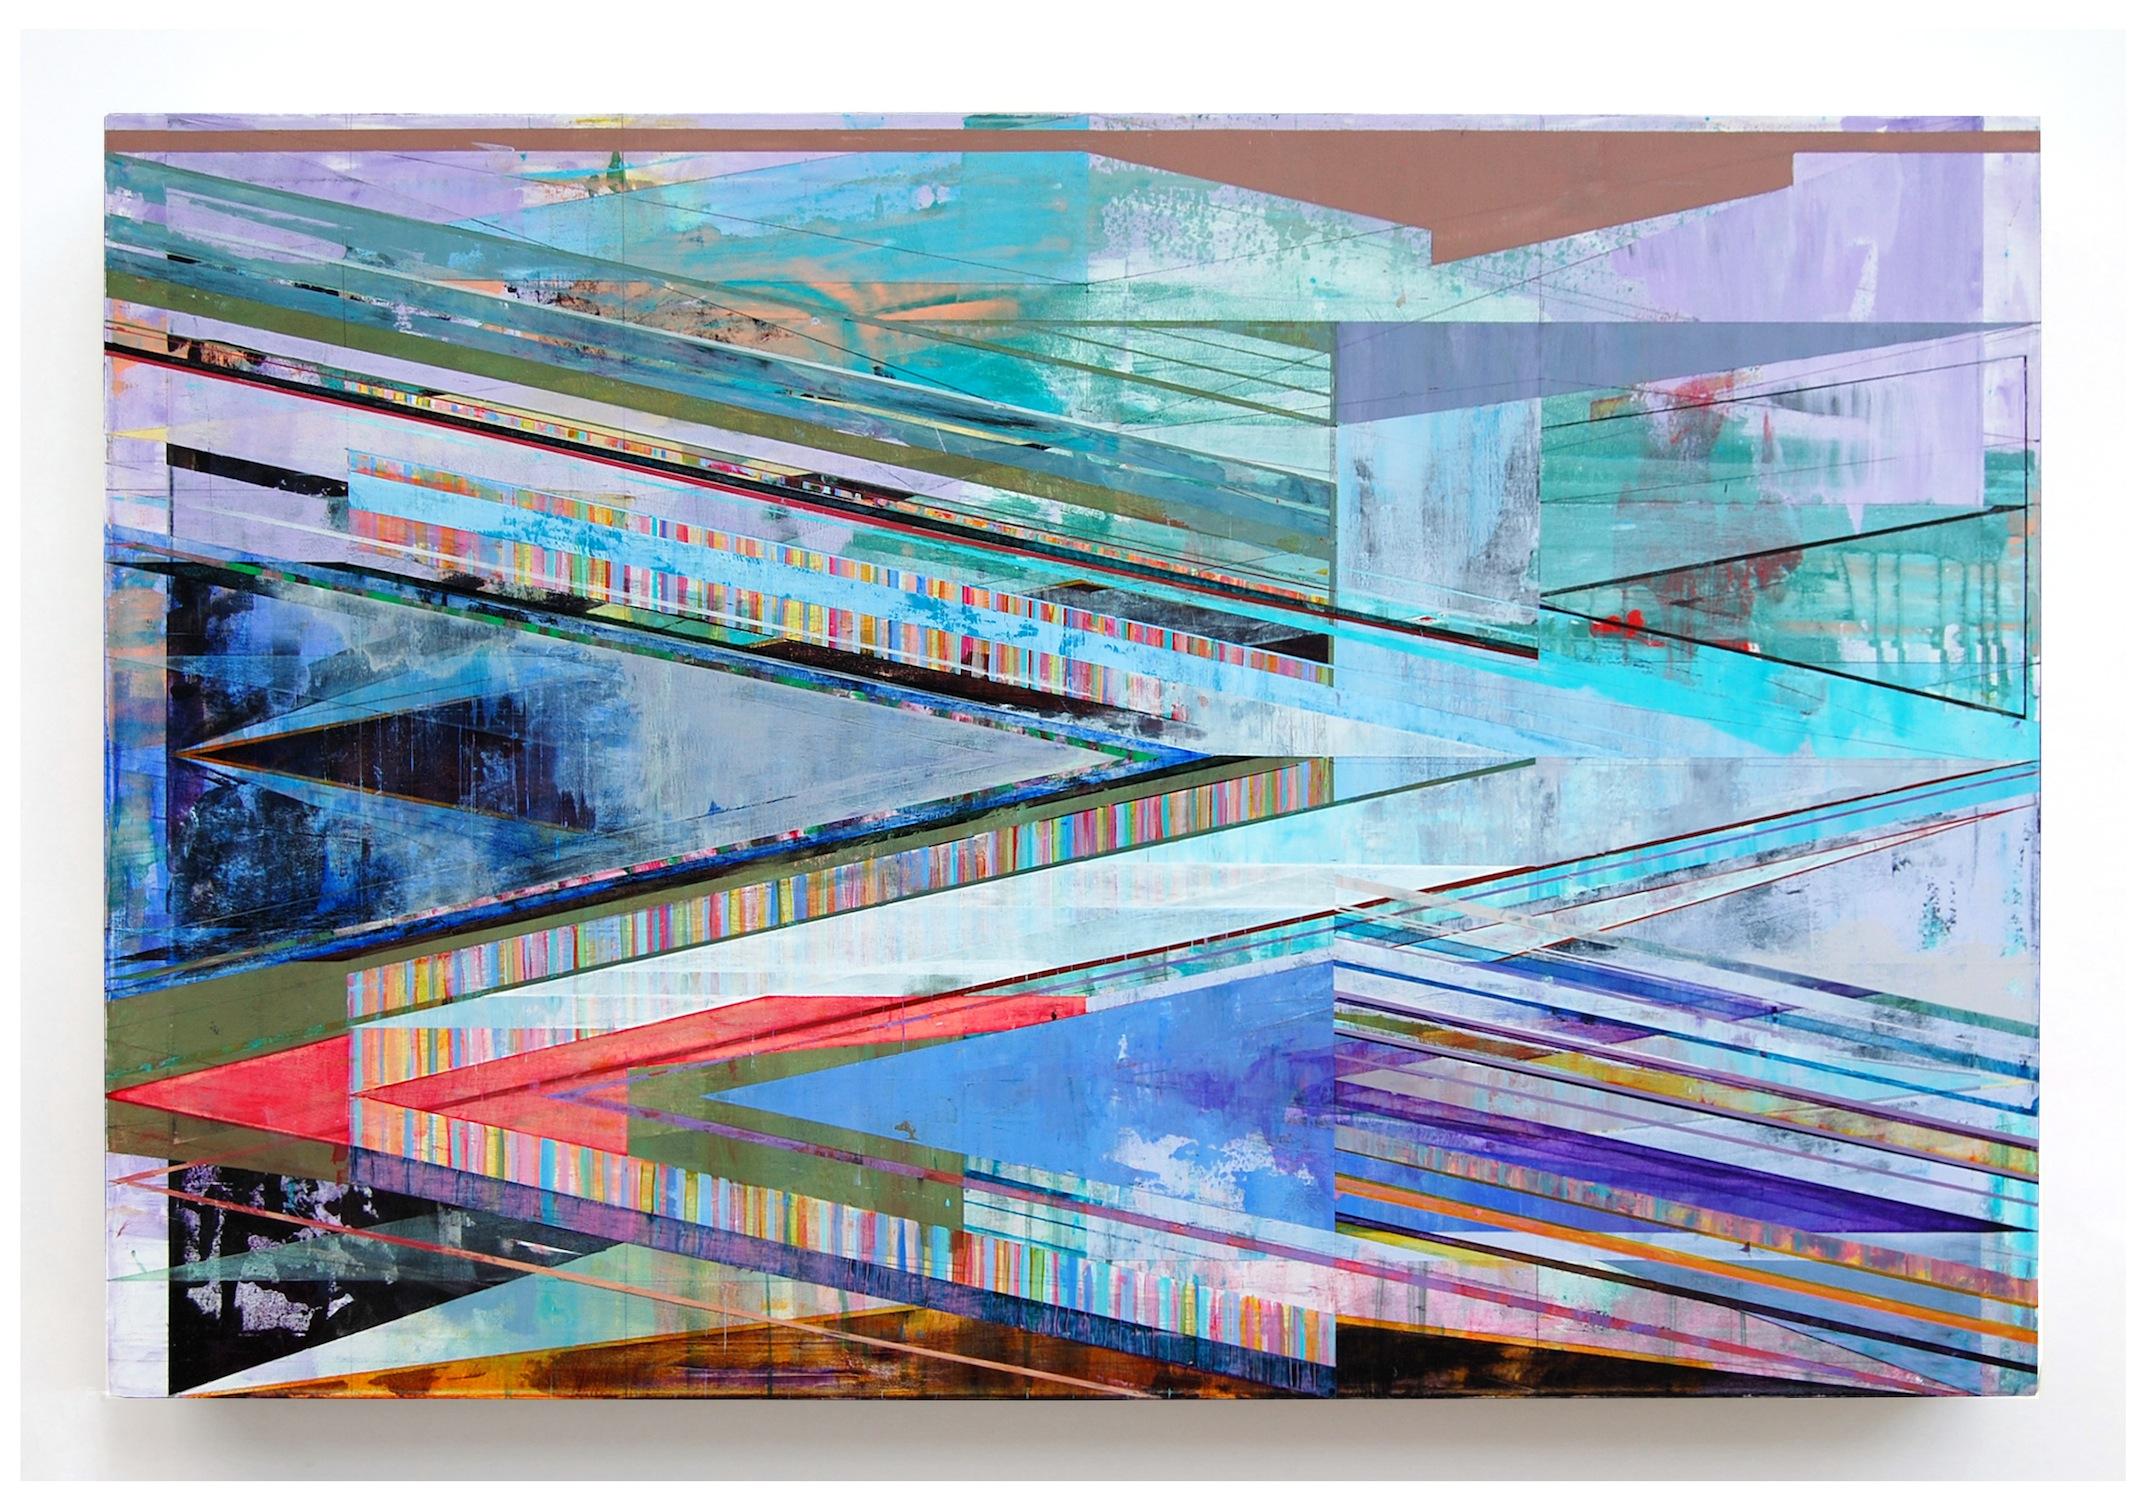 JOE LLOYD, Offset, 2015, acrylic on canvas, 42 x 64 inches